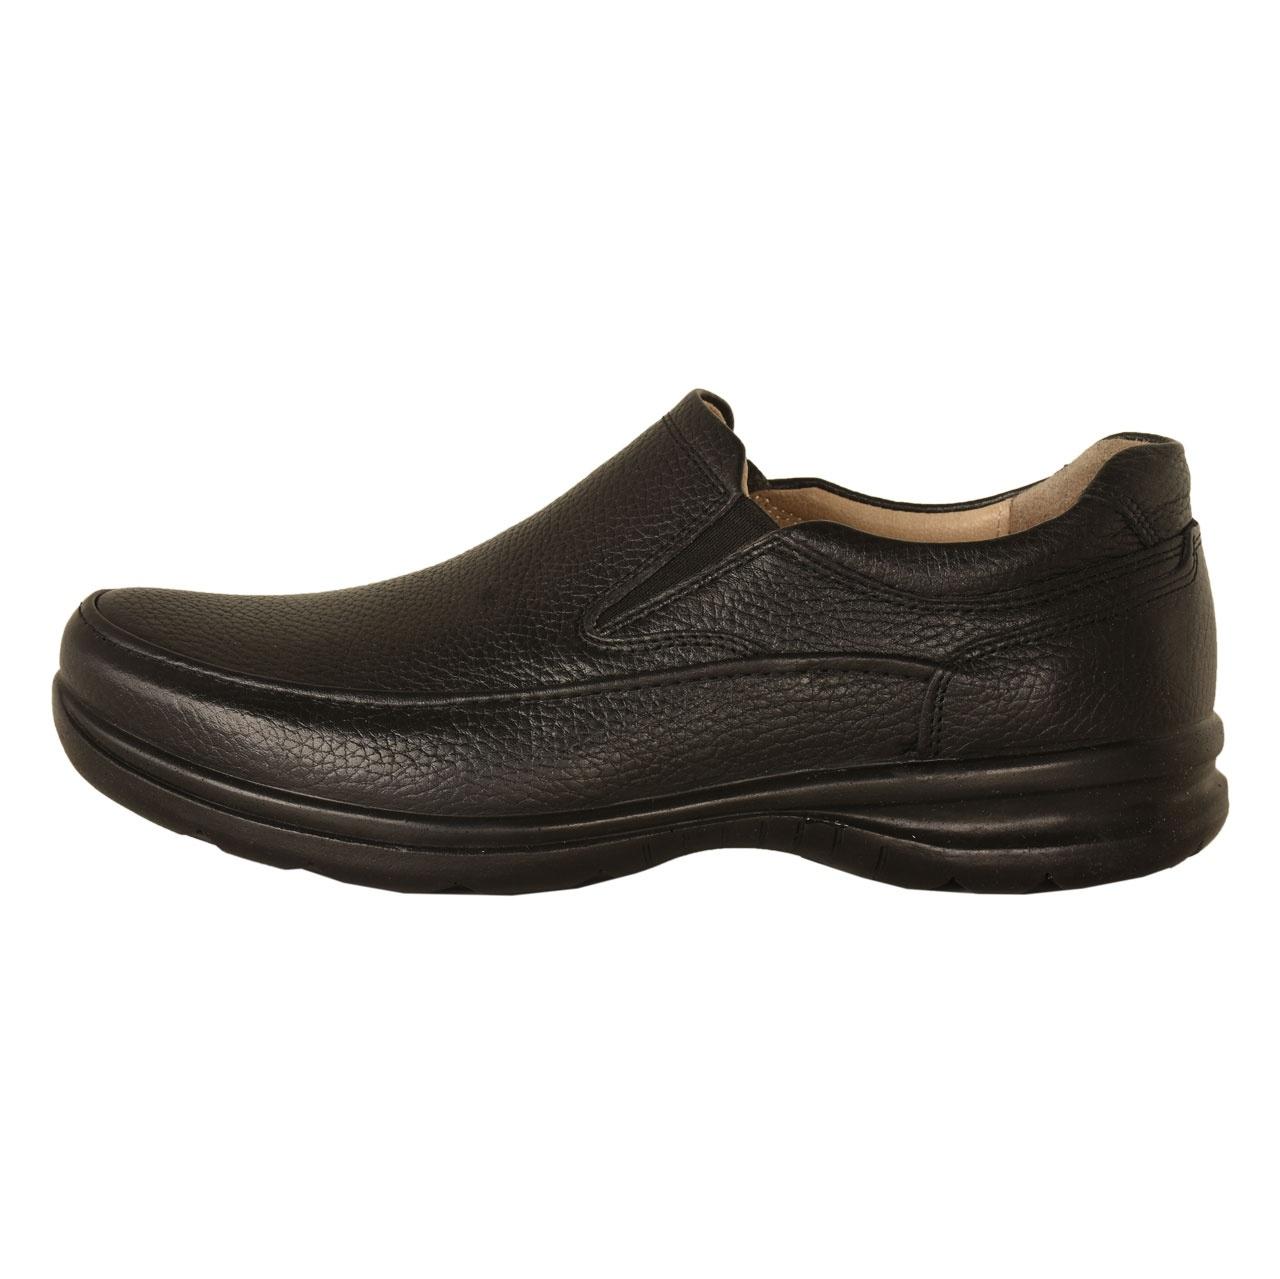 کفش روزمره مردانه مدل SHO136